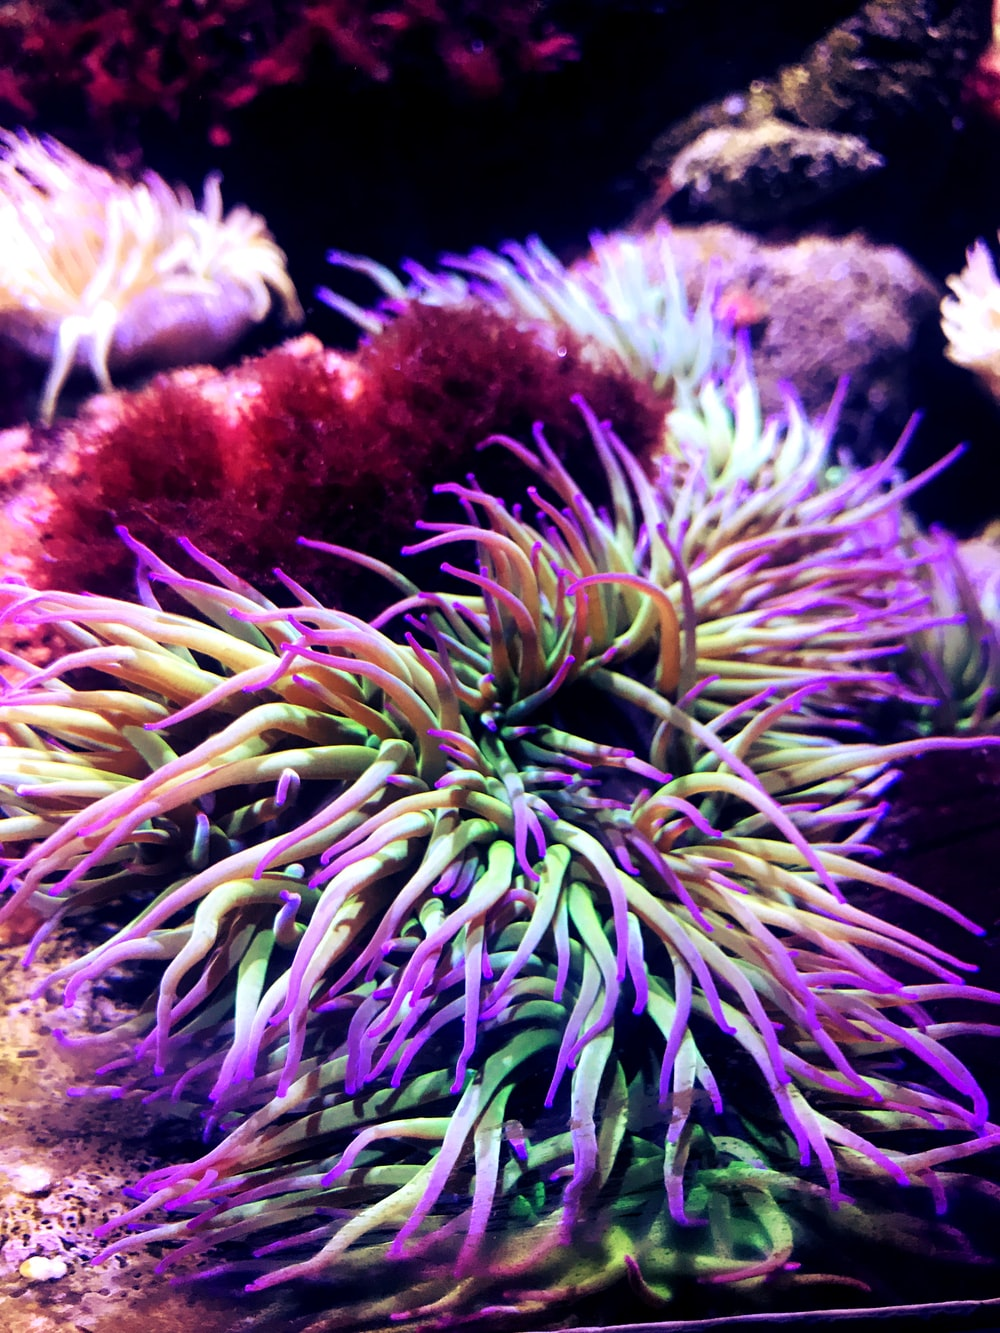 purple and white sea plants